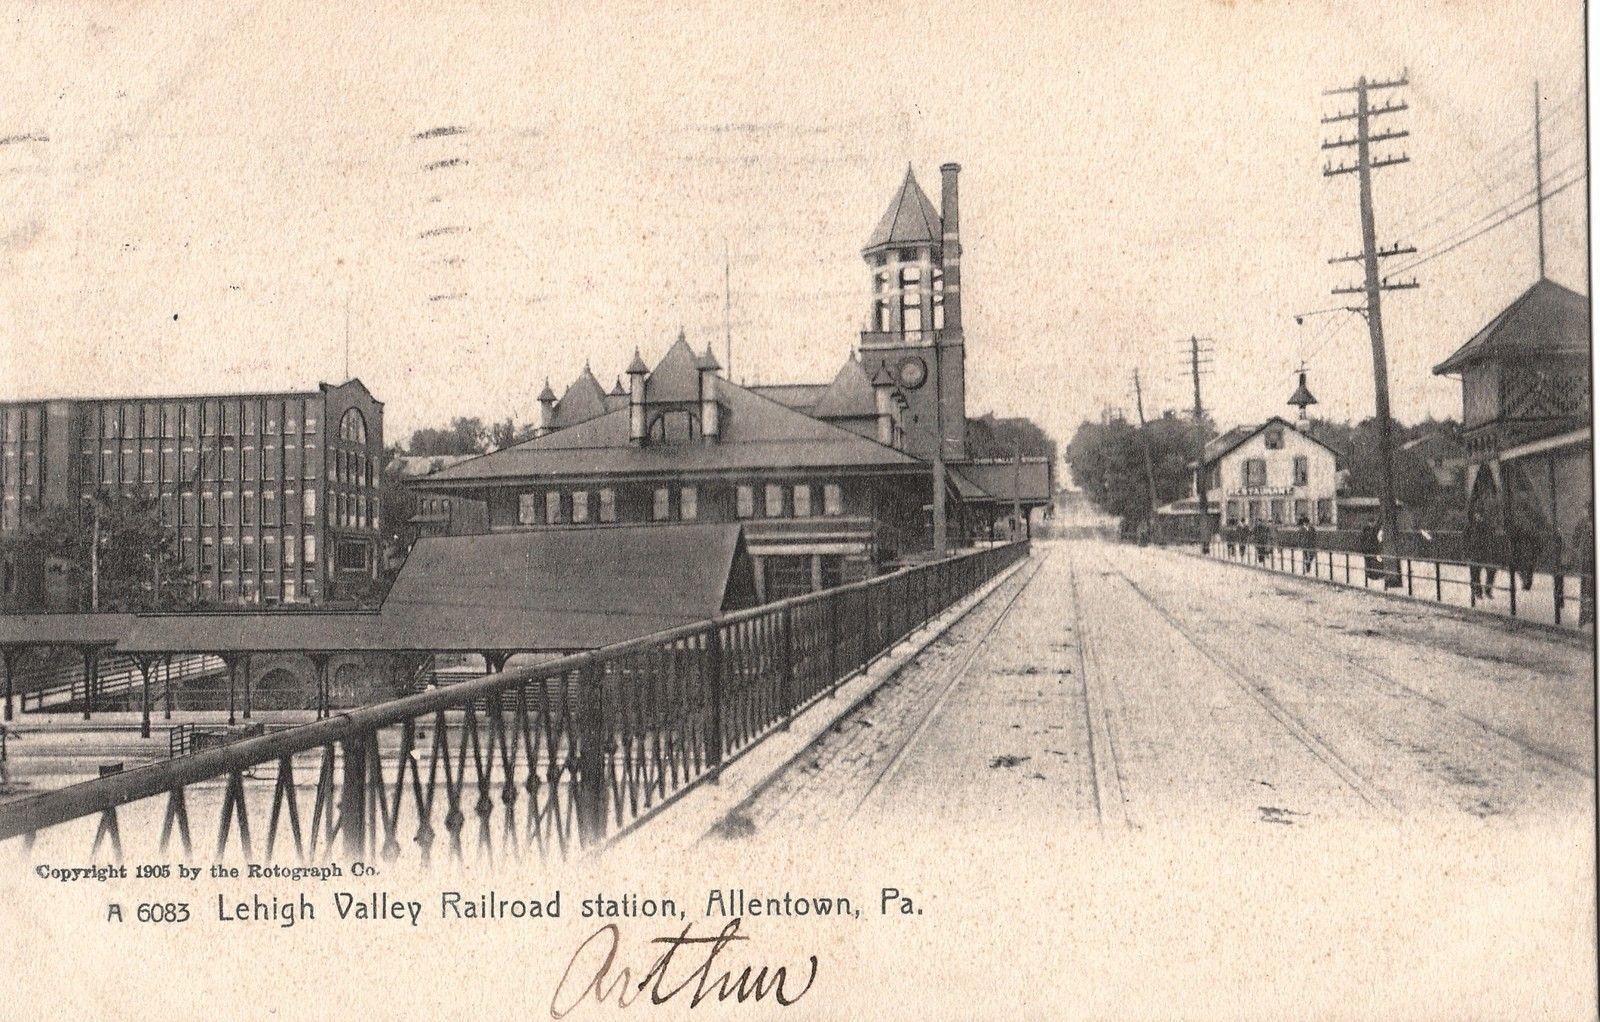 Lehigh Valley Railroad Train Station In Allentown Pa 1911 Lehigh Valley Railroad Station Train Station